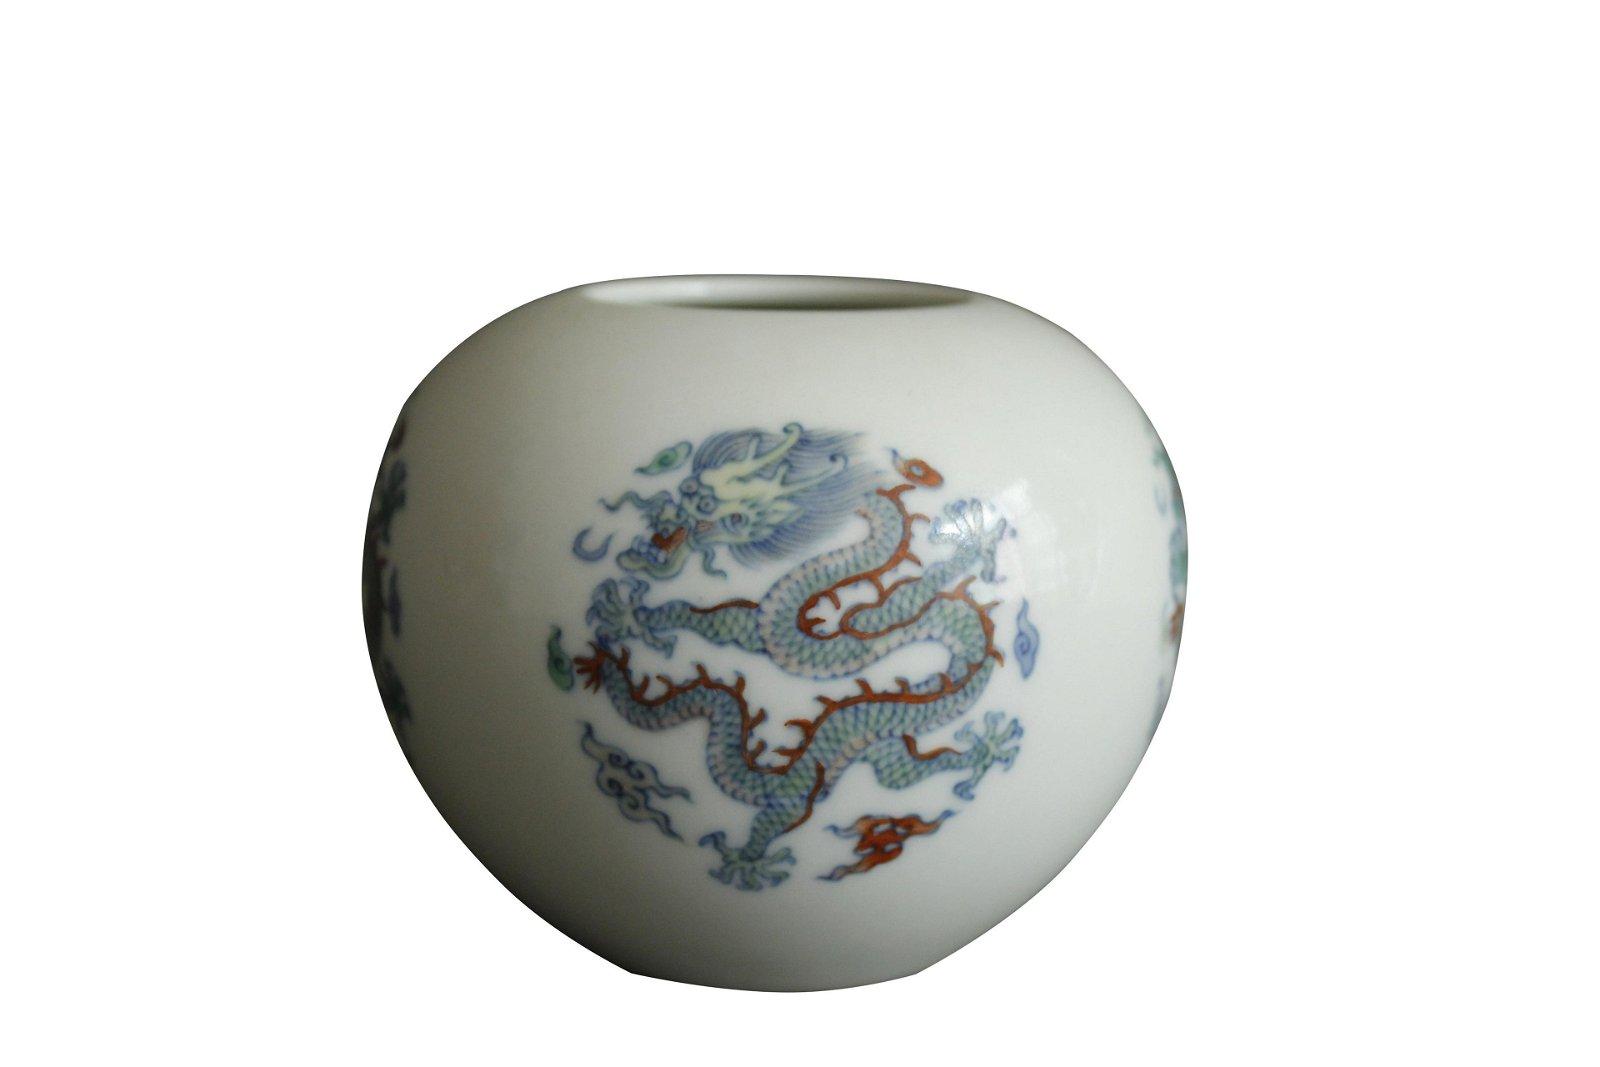 A Chinese Dou-Cai Porcelain Water Pot